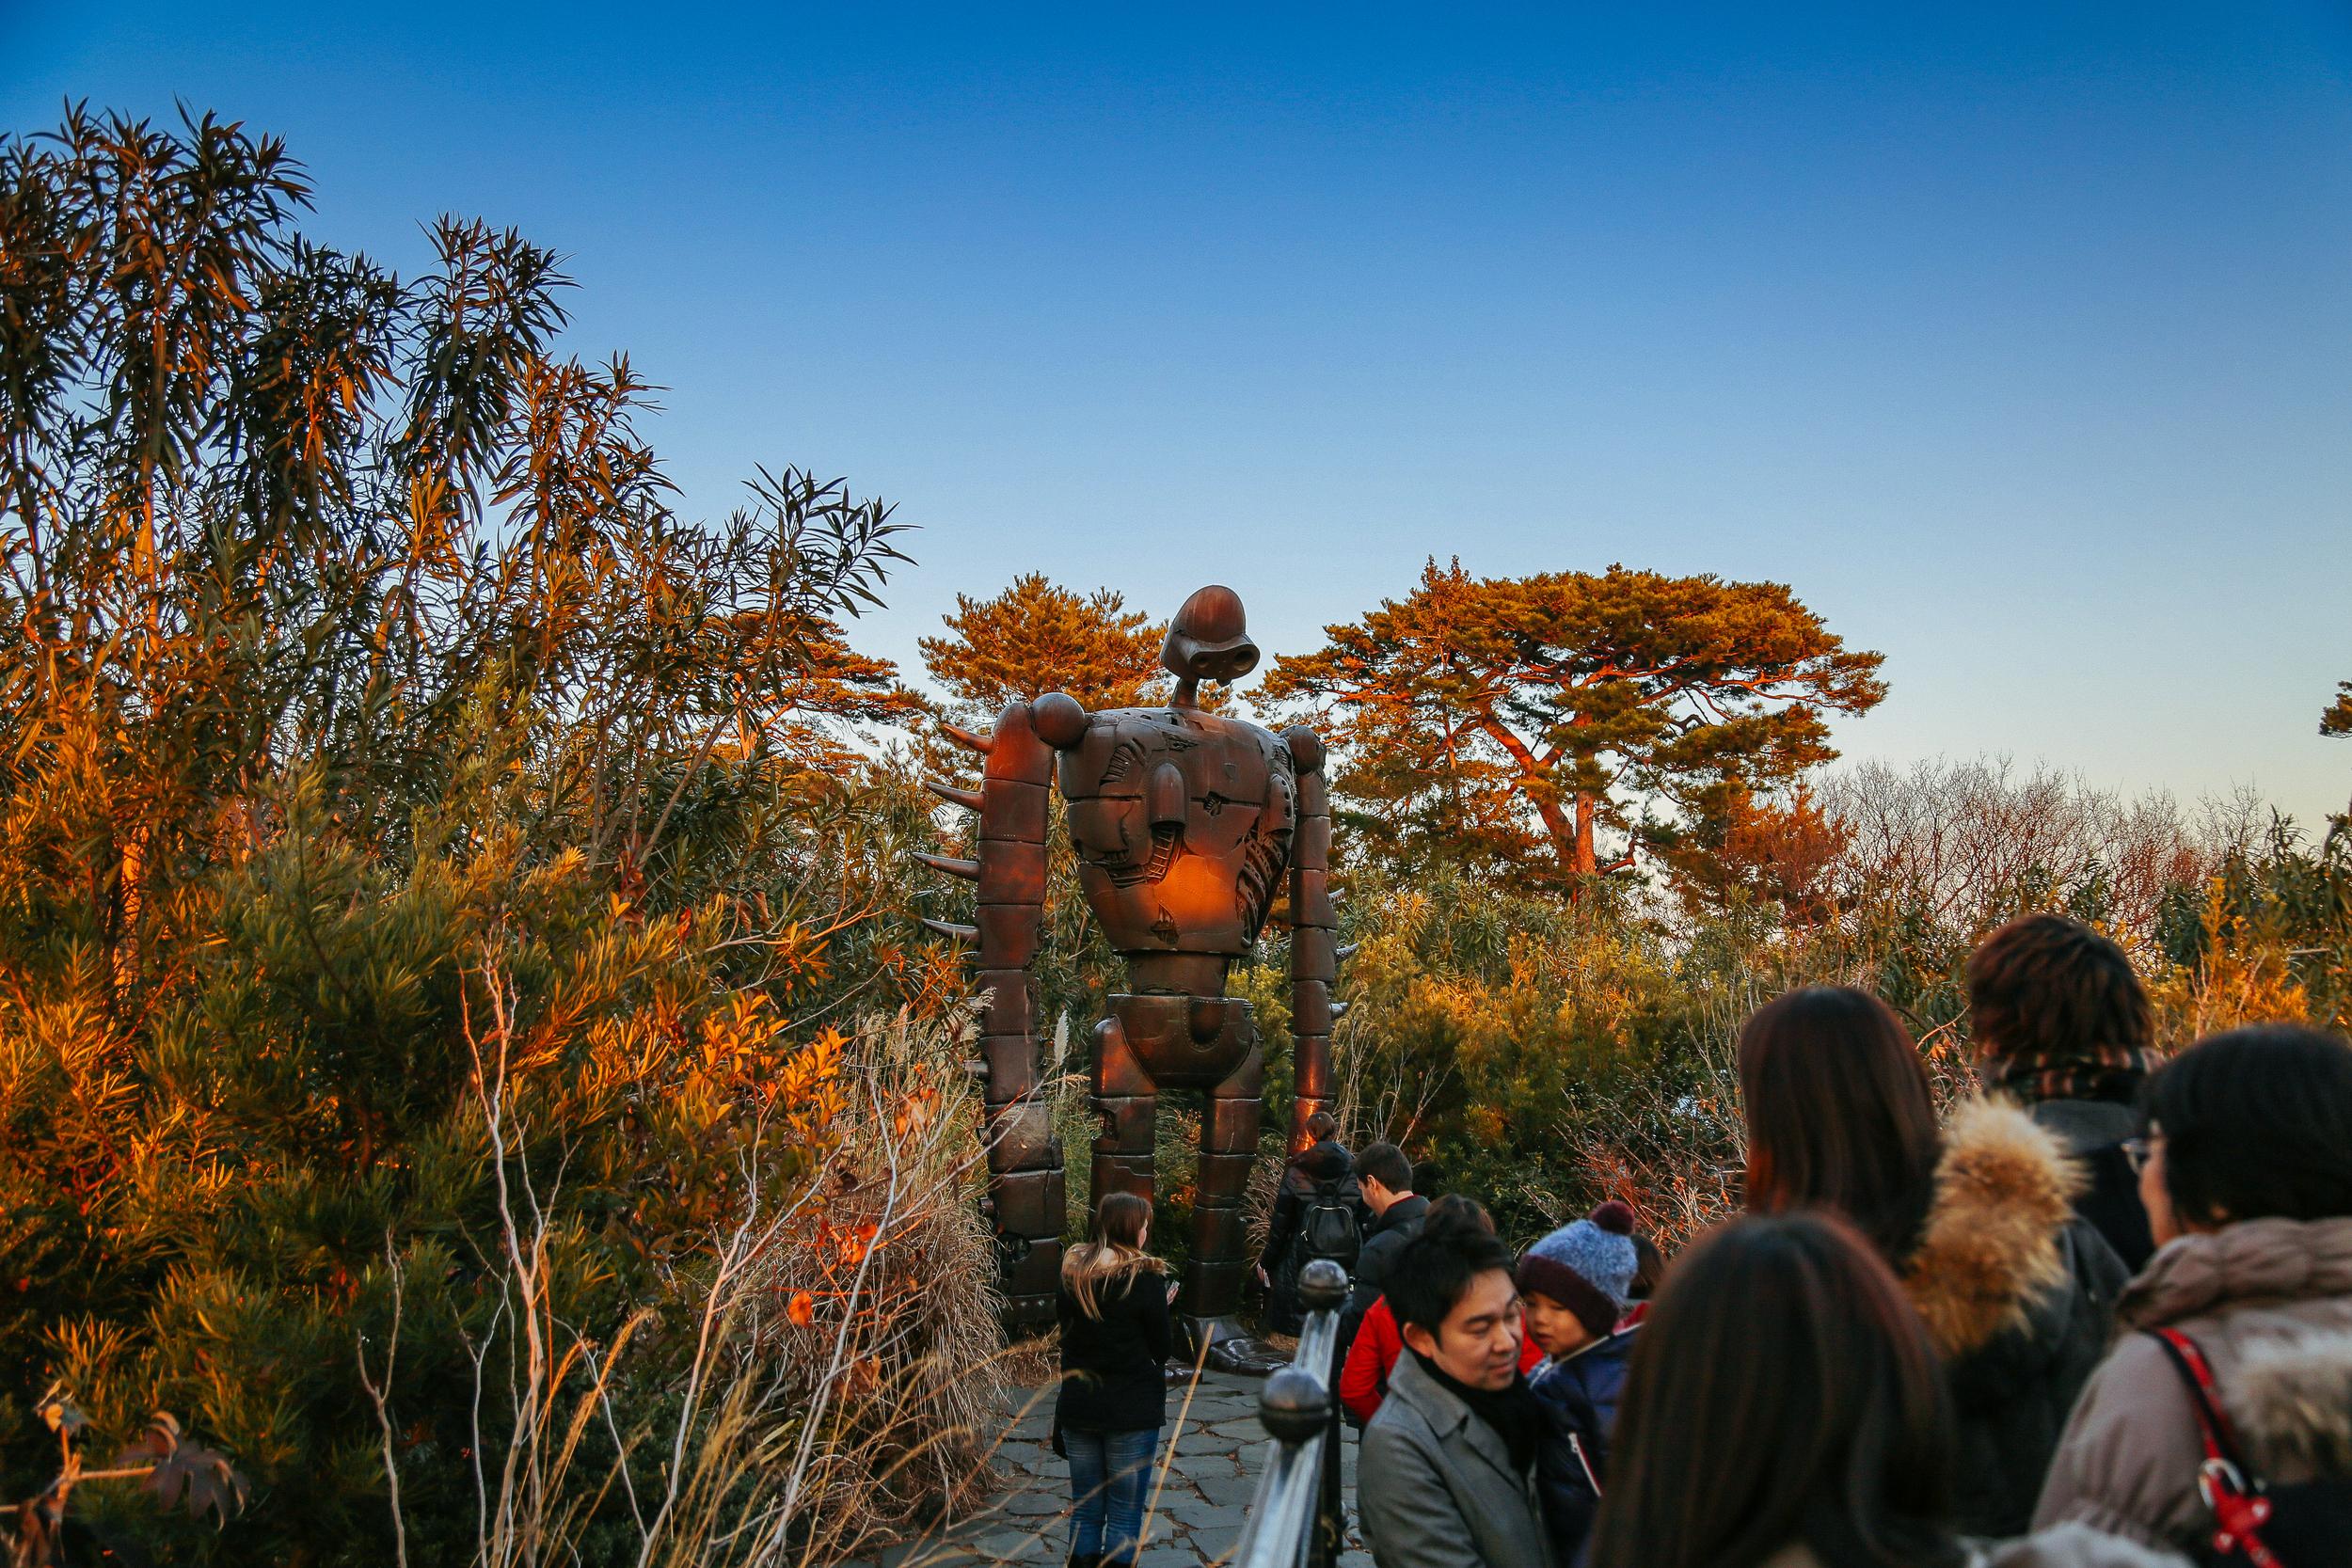 Studio Ghibli Museum Roof Garden Robot -Eric Bravo Photography